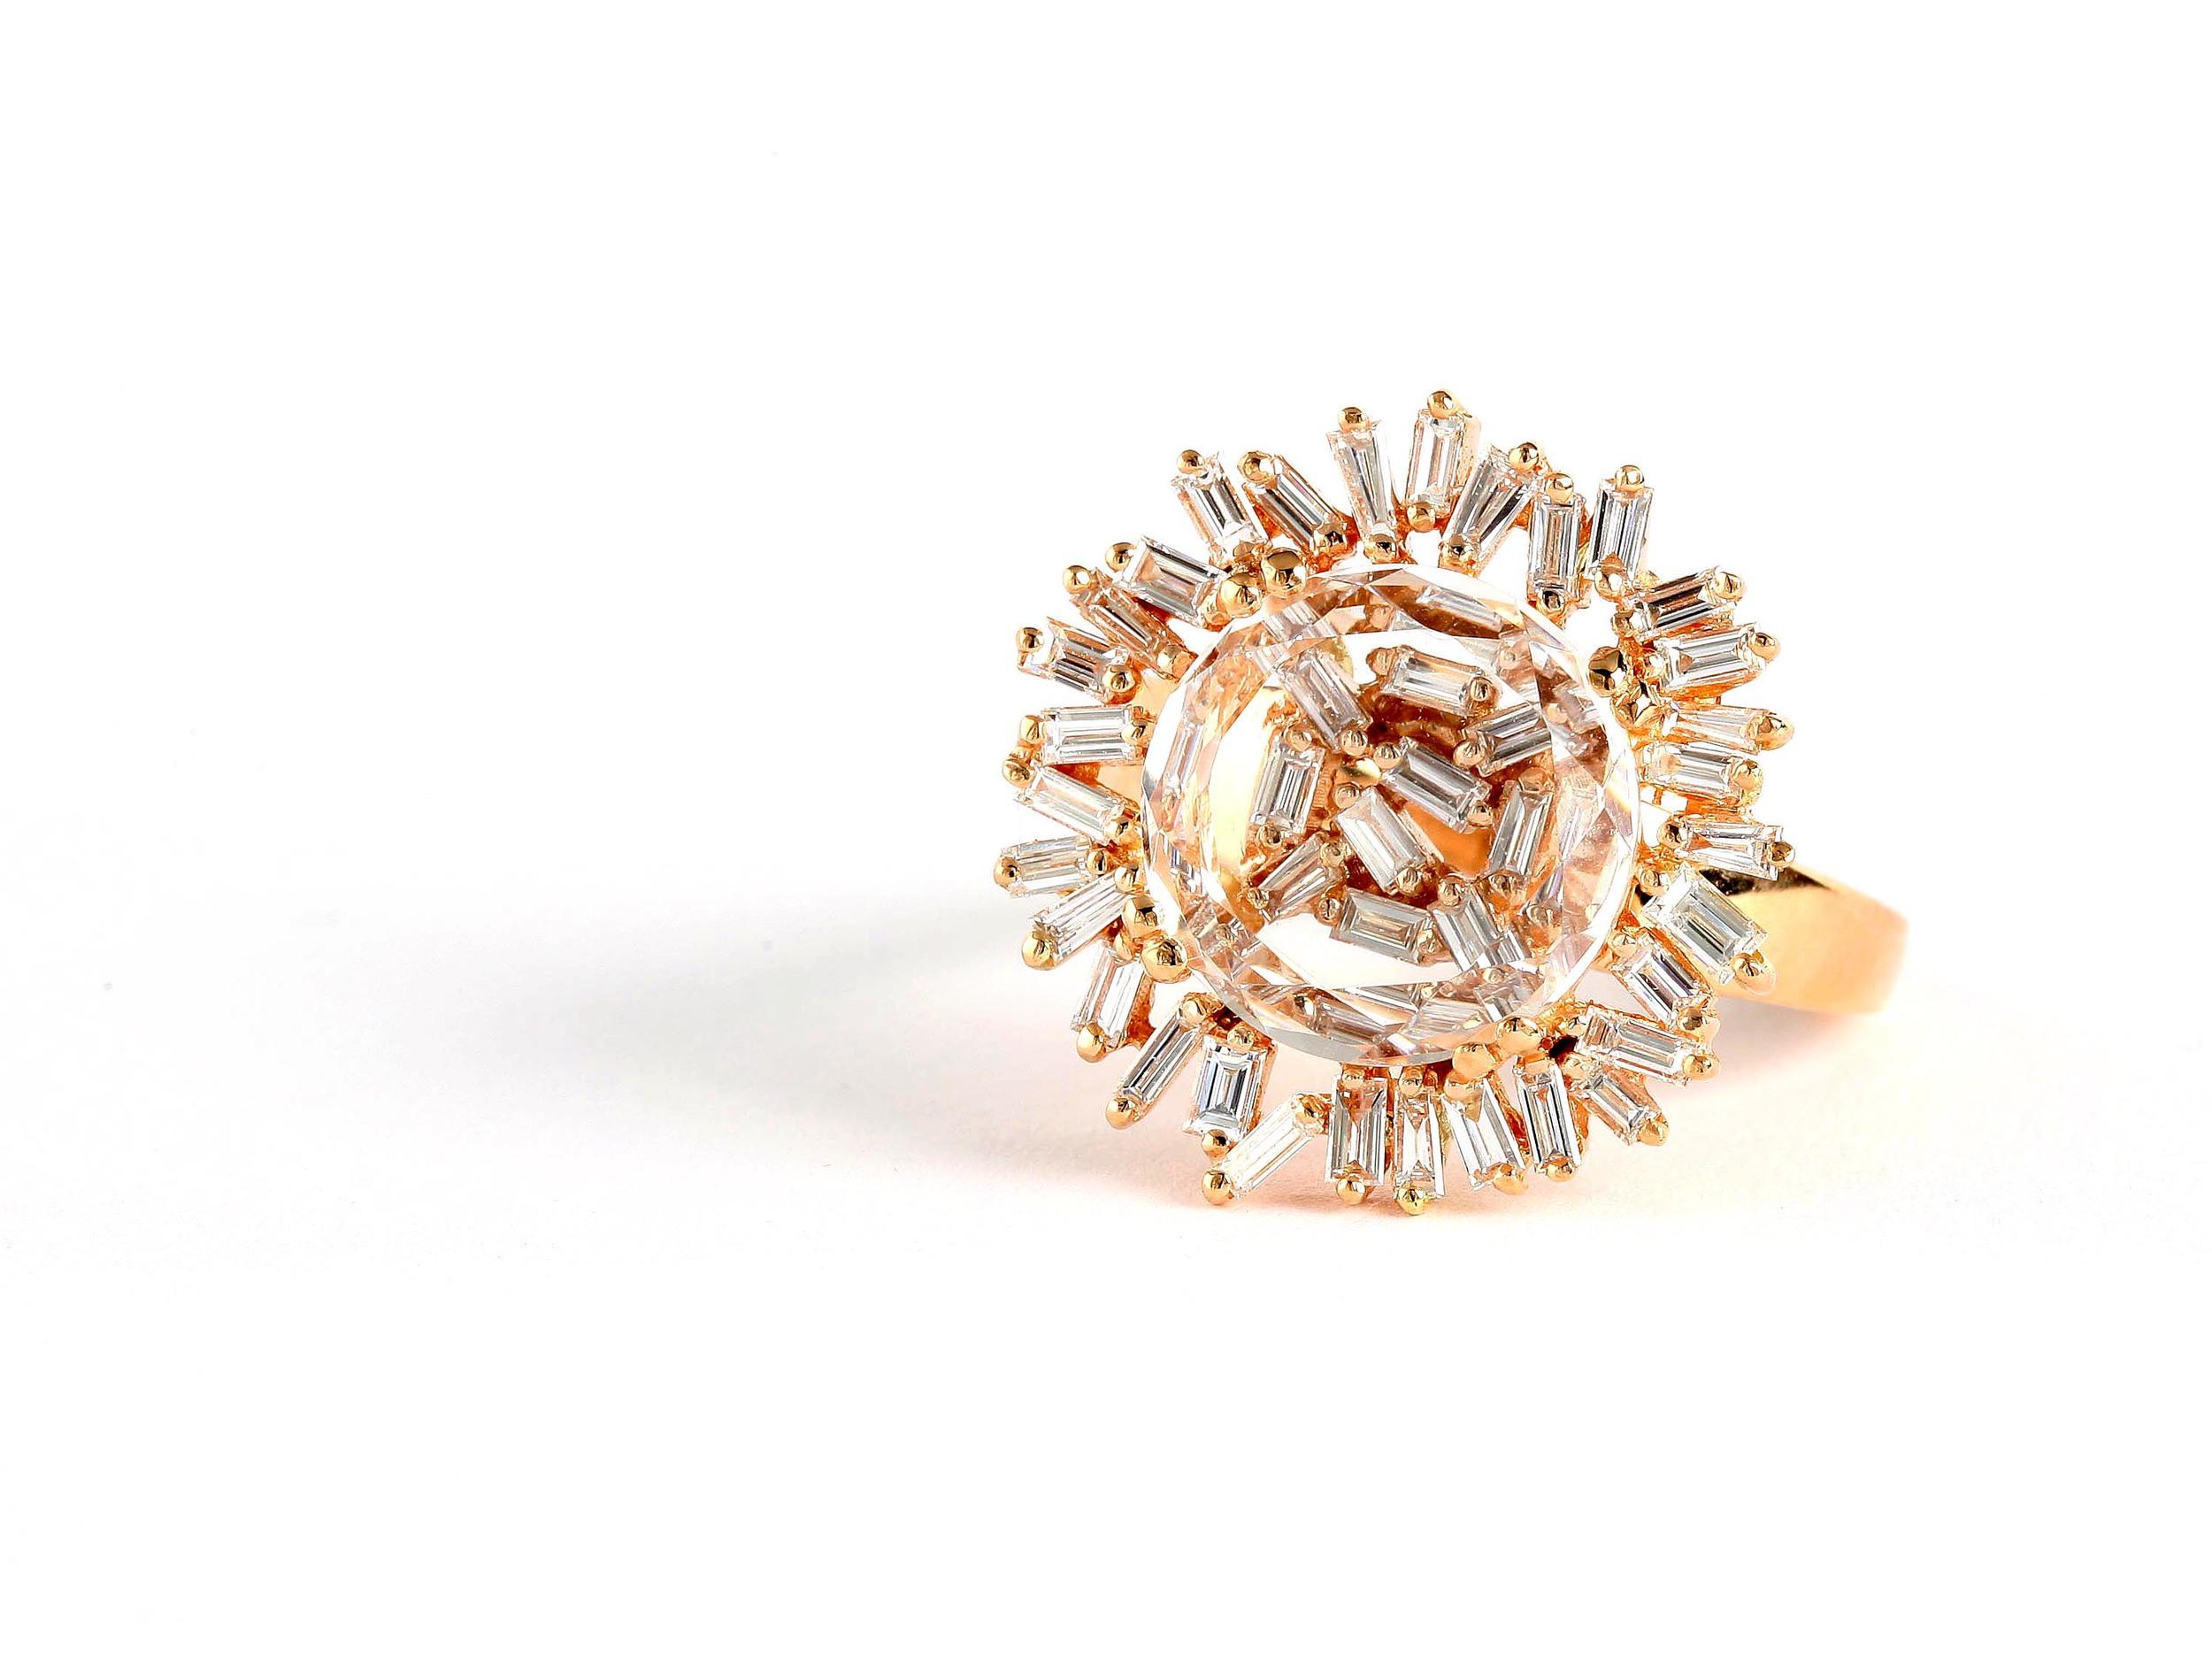 18-karat gold and diamond ring.